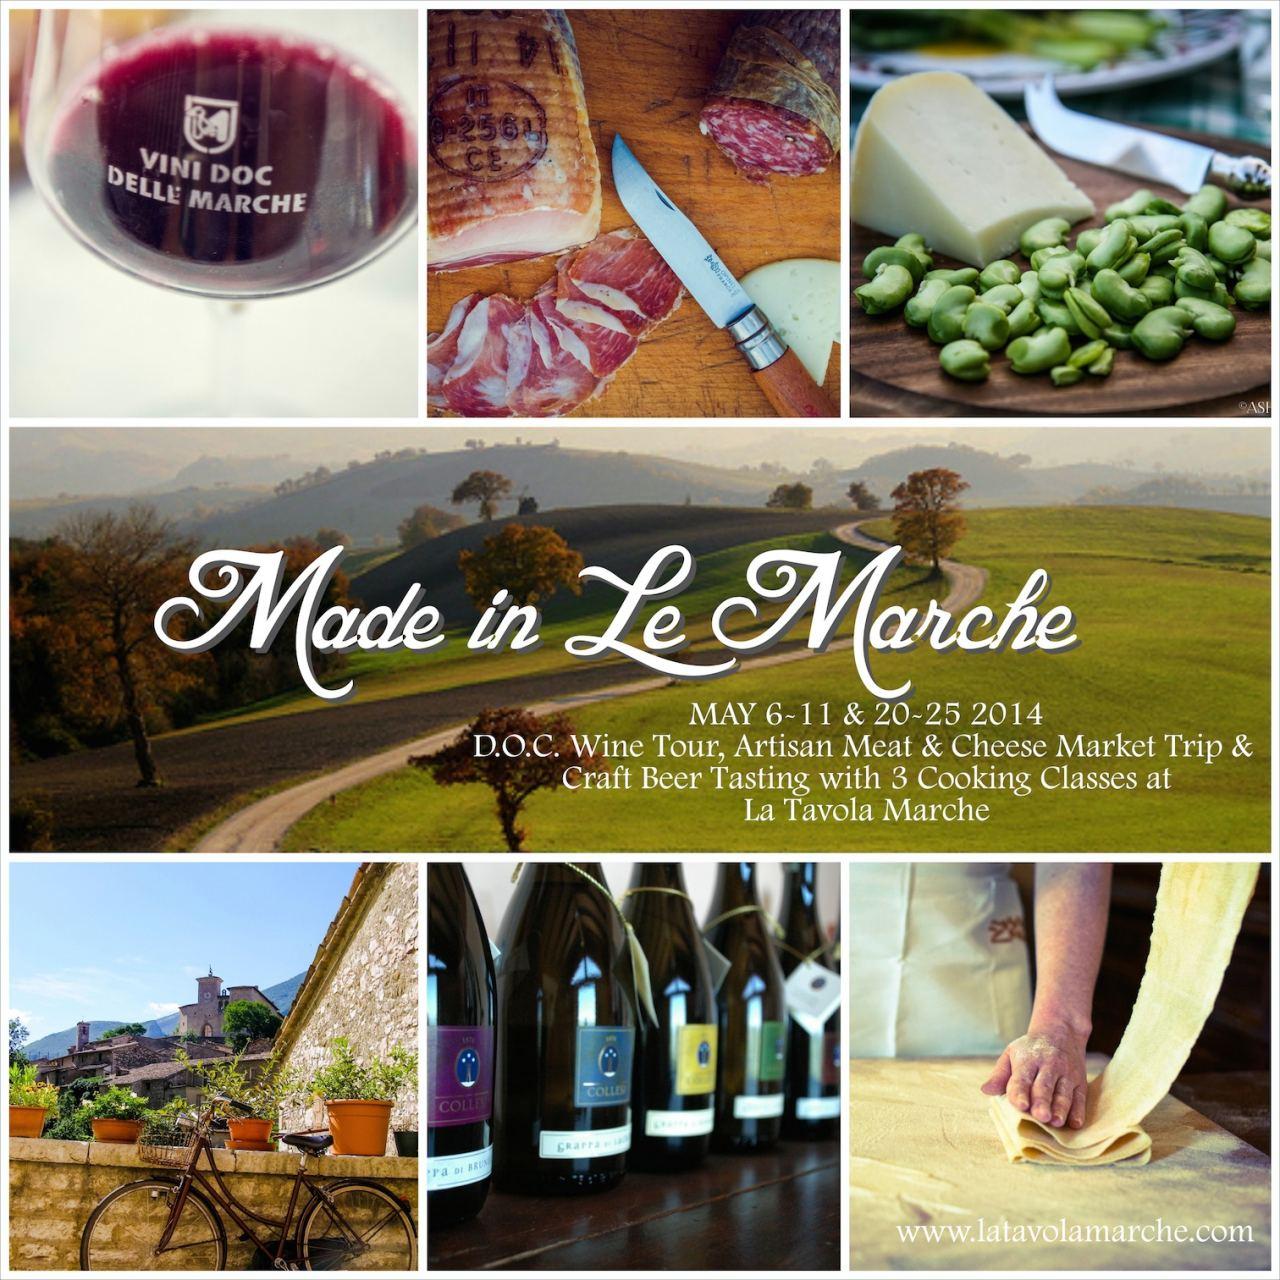 Made in Le Marche, Gourmet Italian Getaway